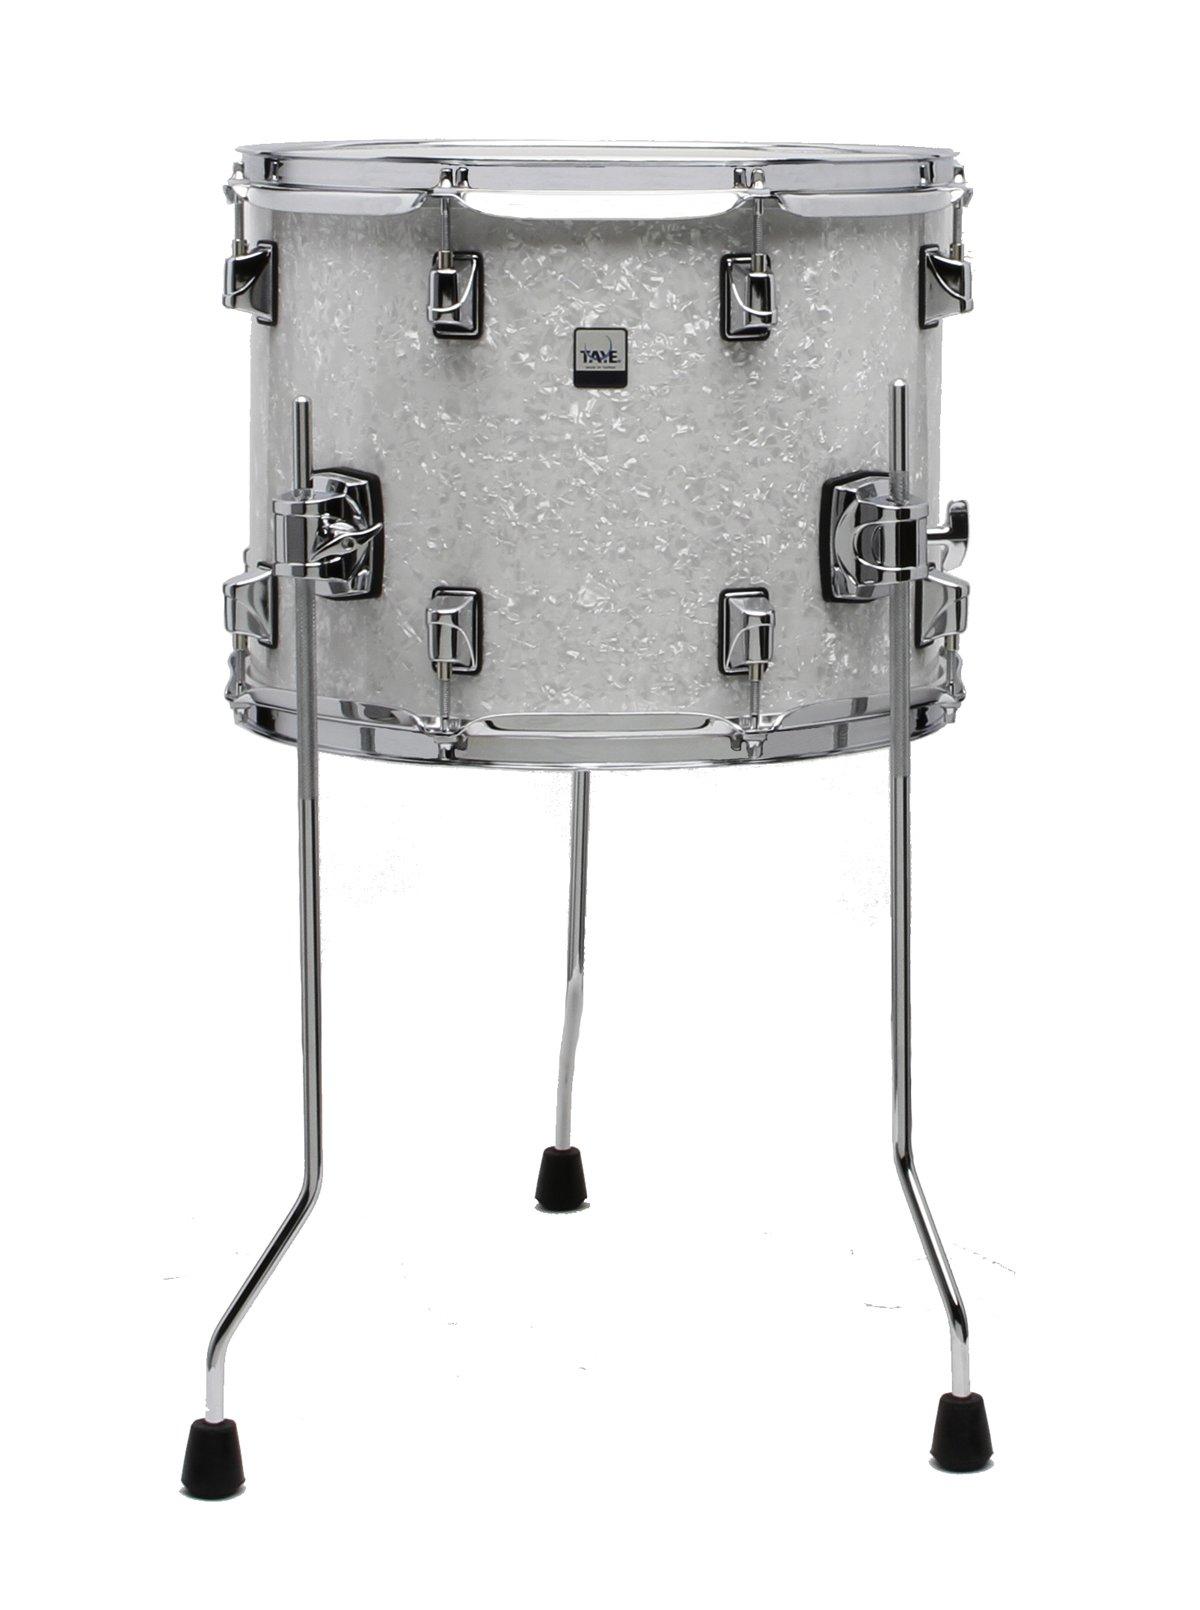 Taye Drums GK1411F-WP 14-Inch GoKit Add-On Floor Tom Tom